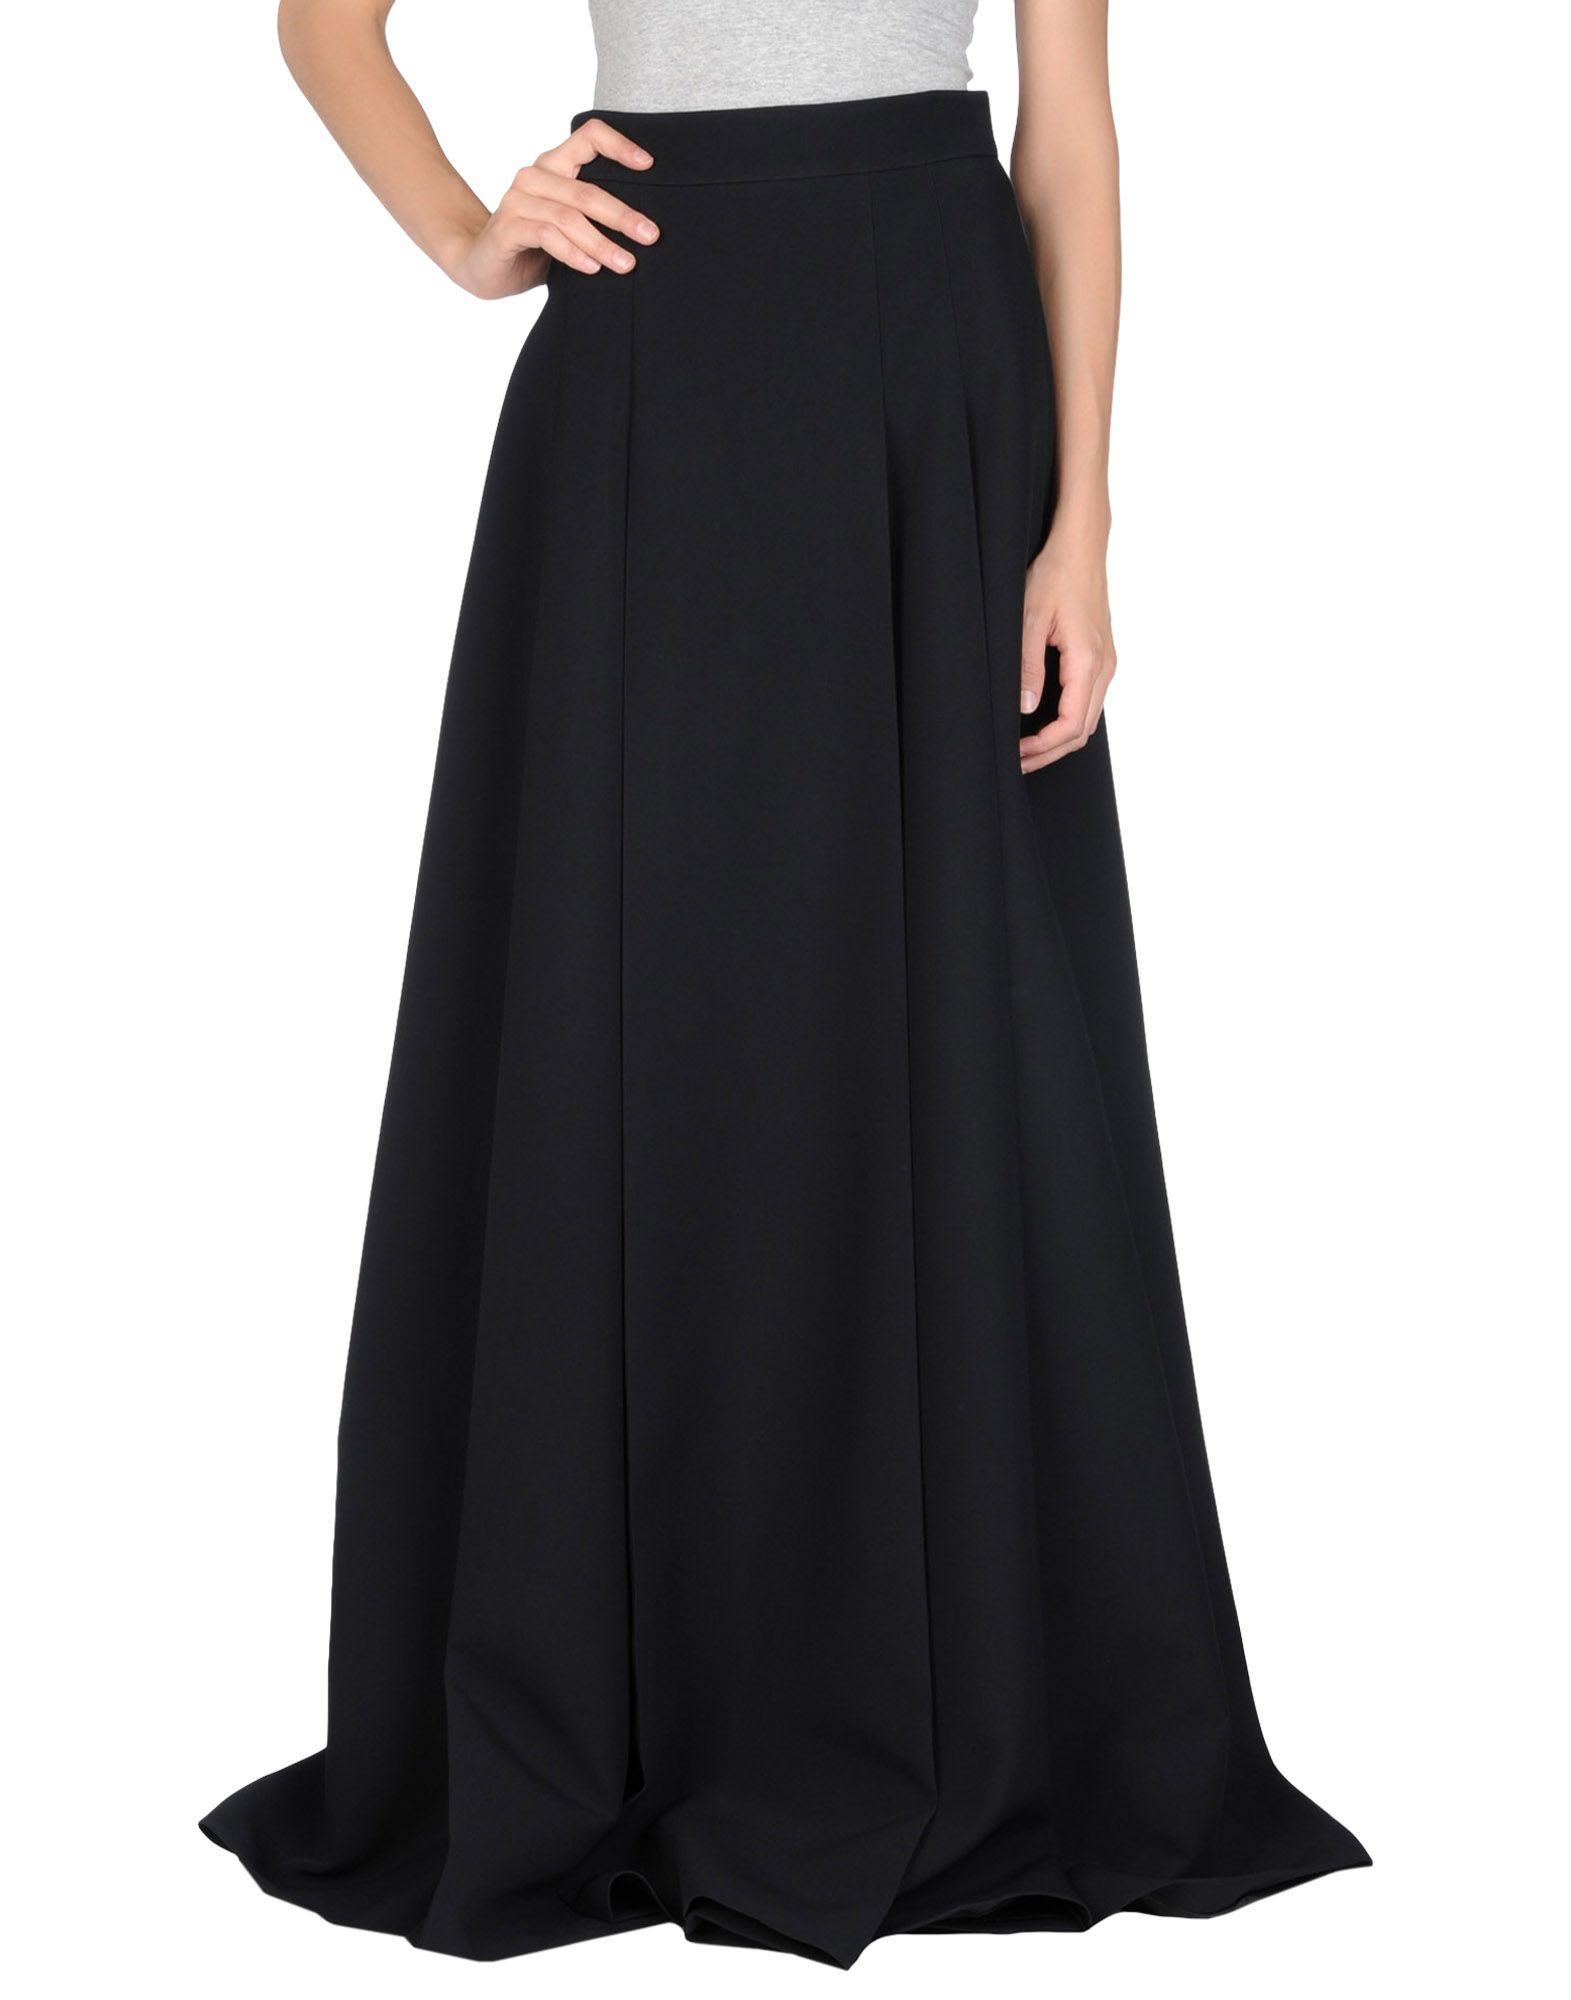 Fausto puglisi Long Skirt in Black